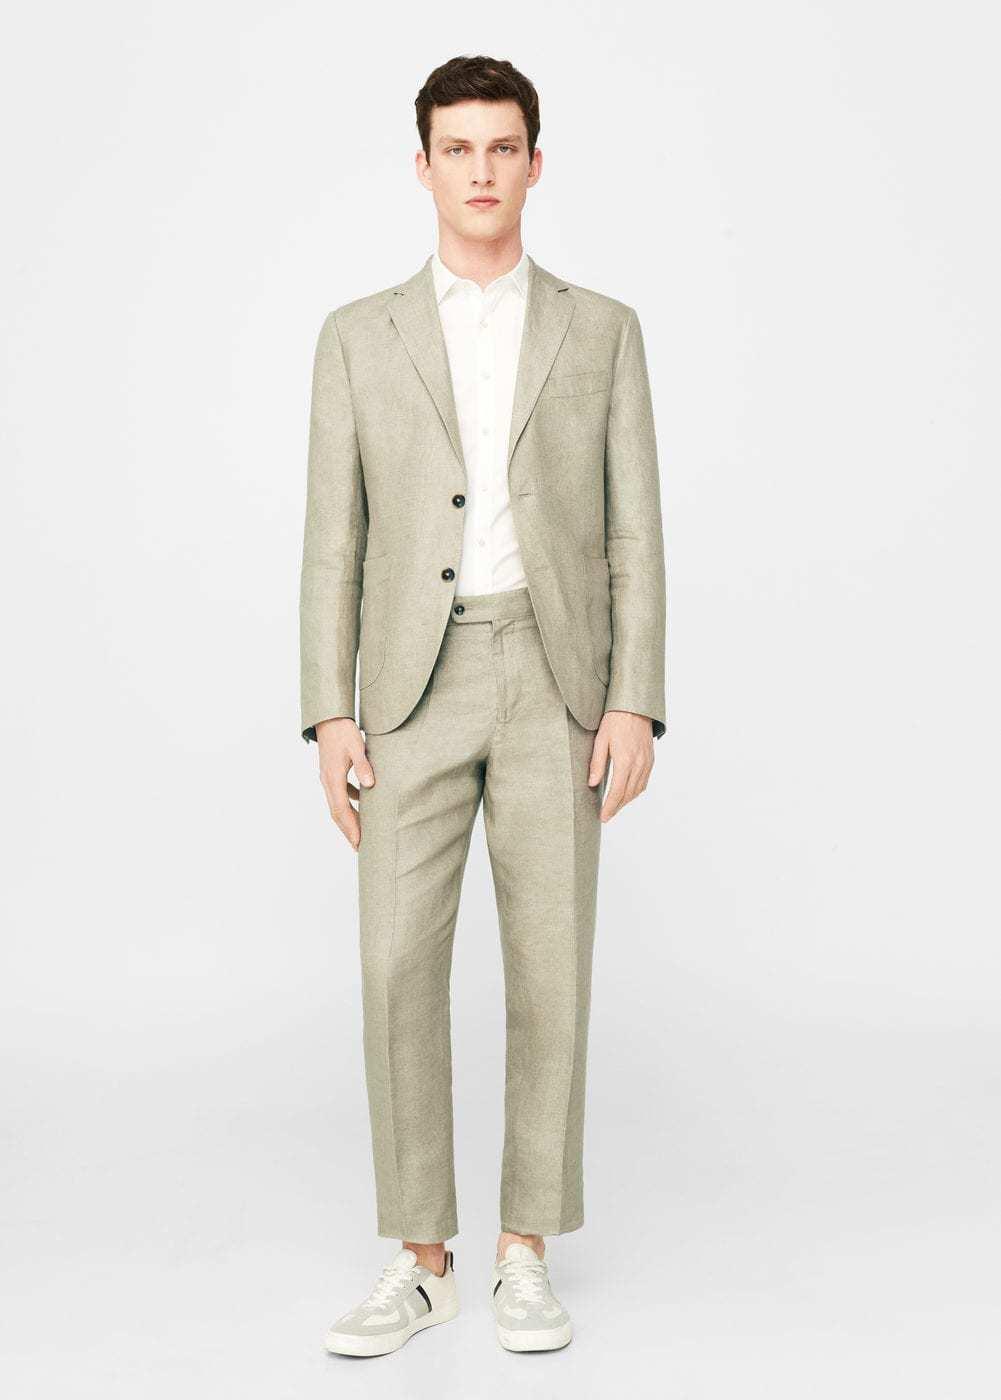 ea37b7bb3a8f Men's Beige Linen Blazer, White Short Sleeve Shirt, Beige Linen Dress Pants,  Beige